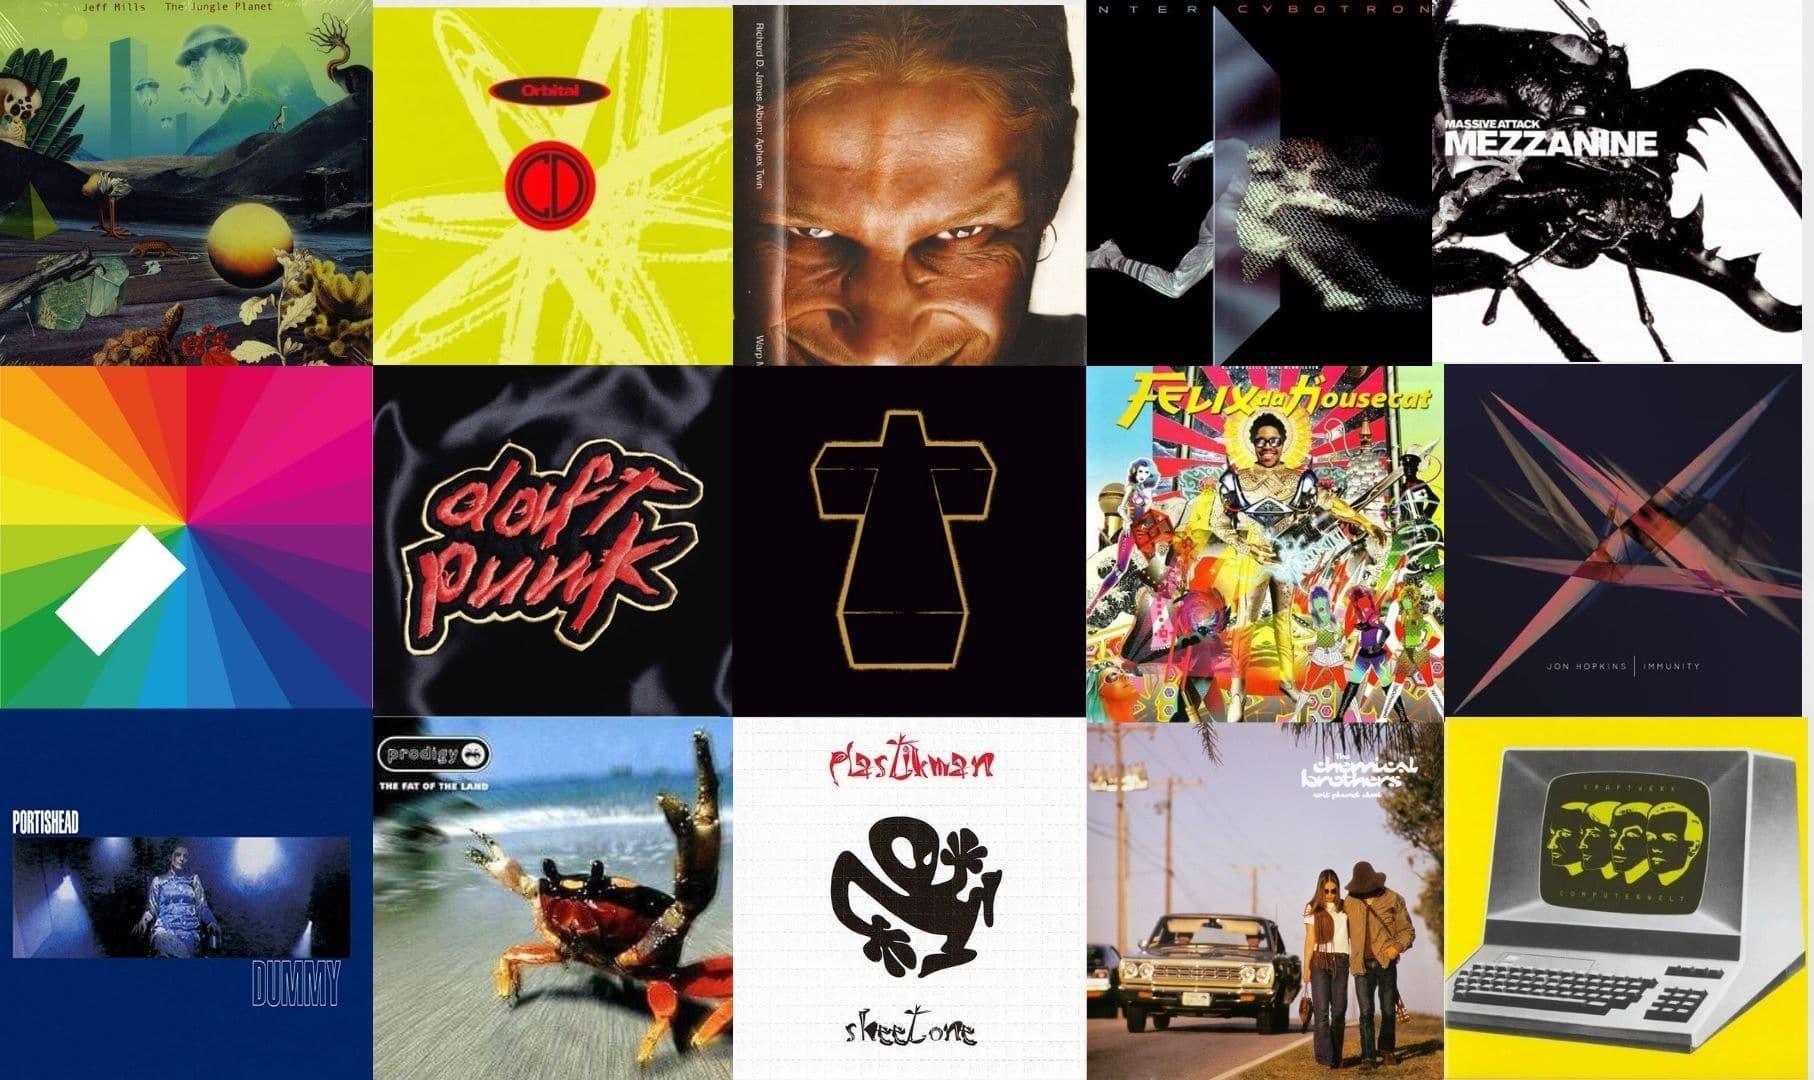 iconic electronic album covers